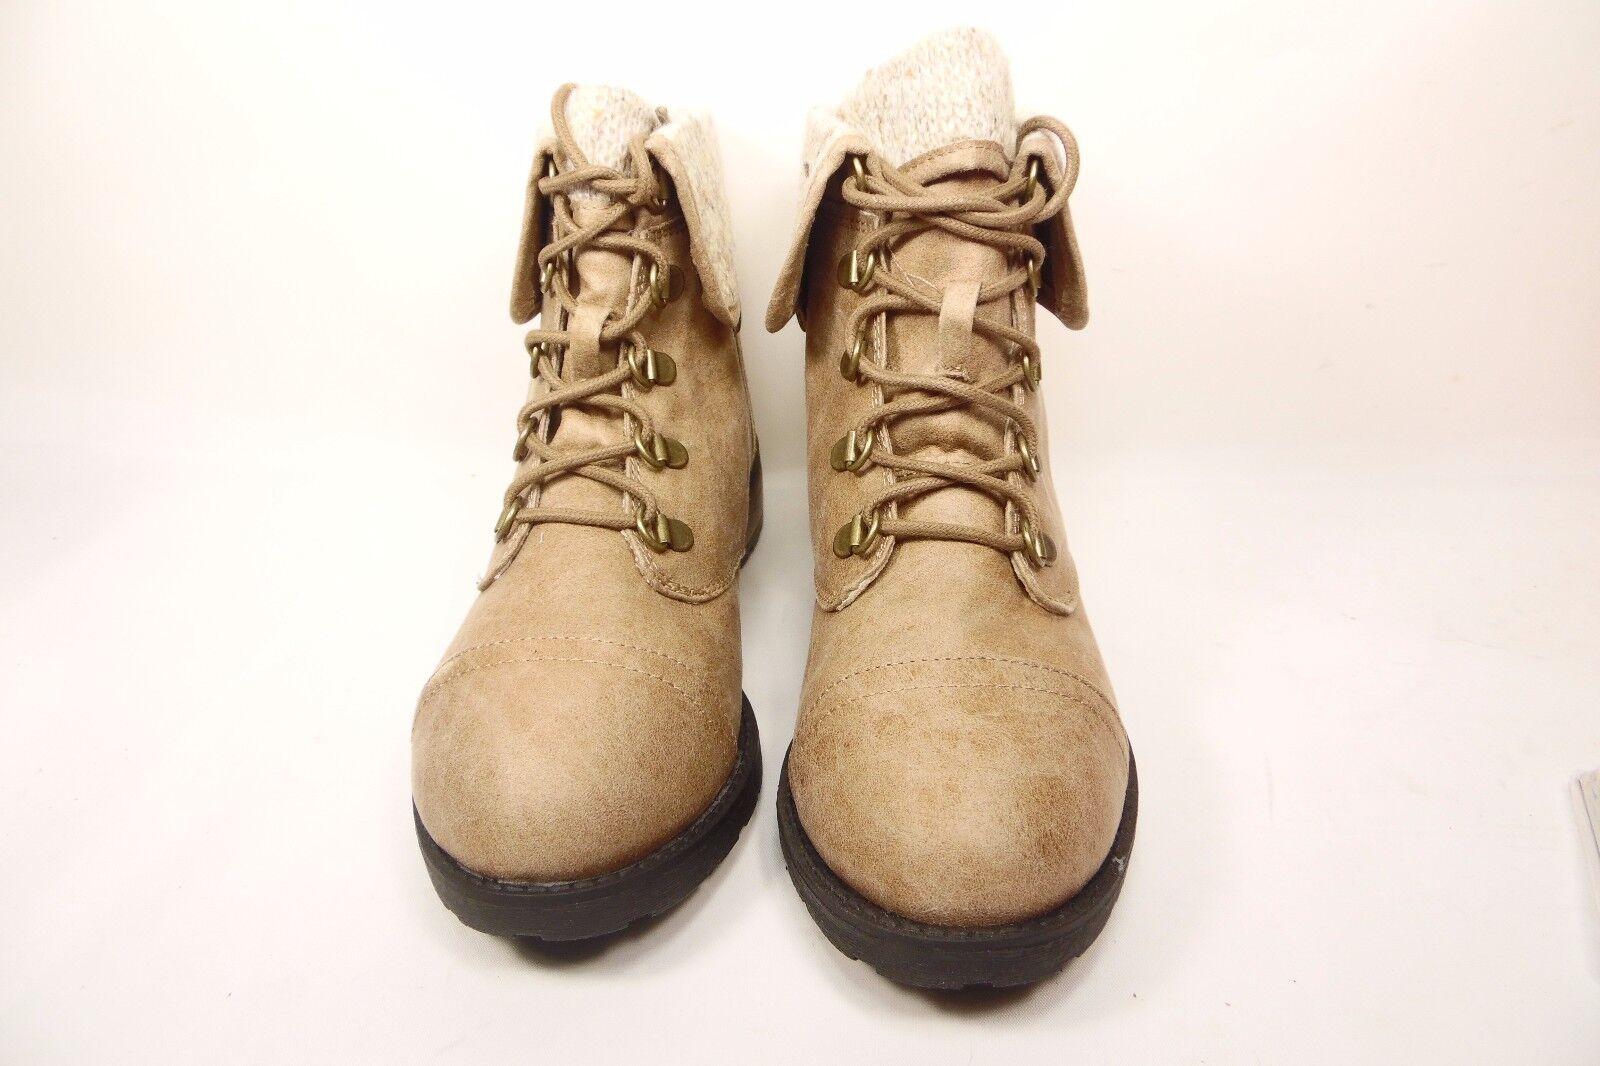 Arizona Daisy Womens Lace-Up Boots Taupe Size 8M